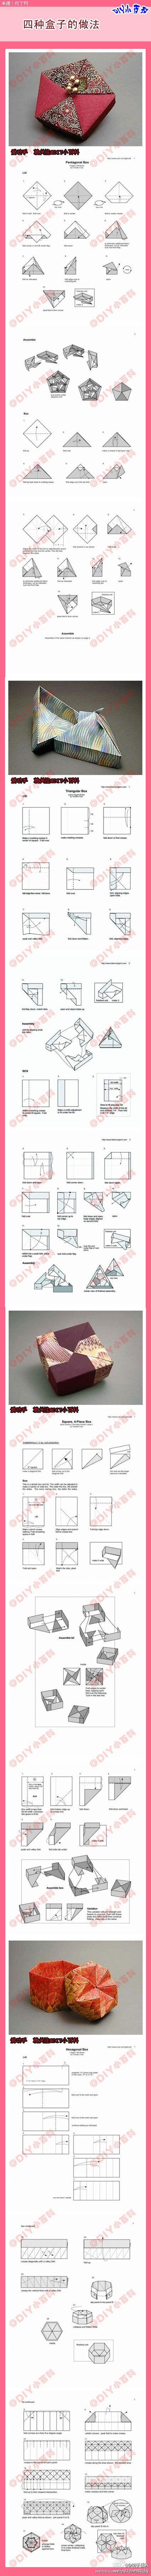 bella cajita de origami